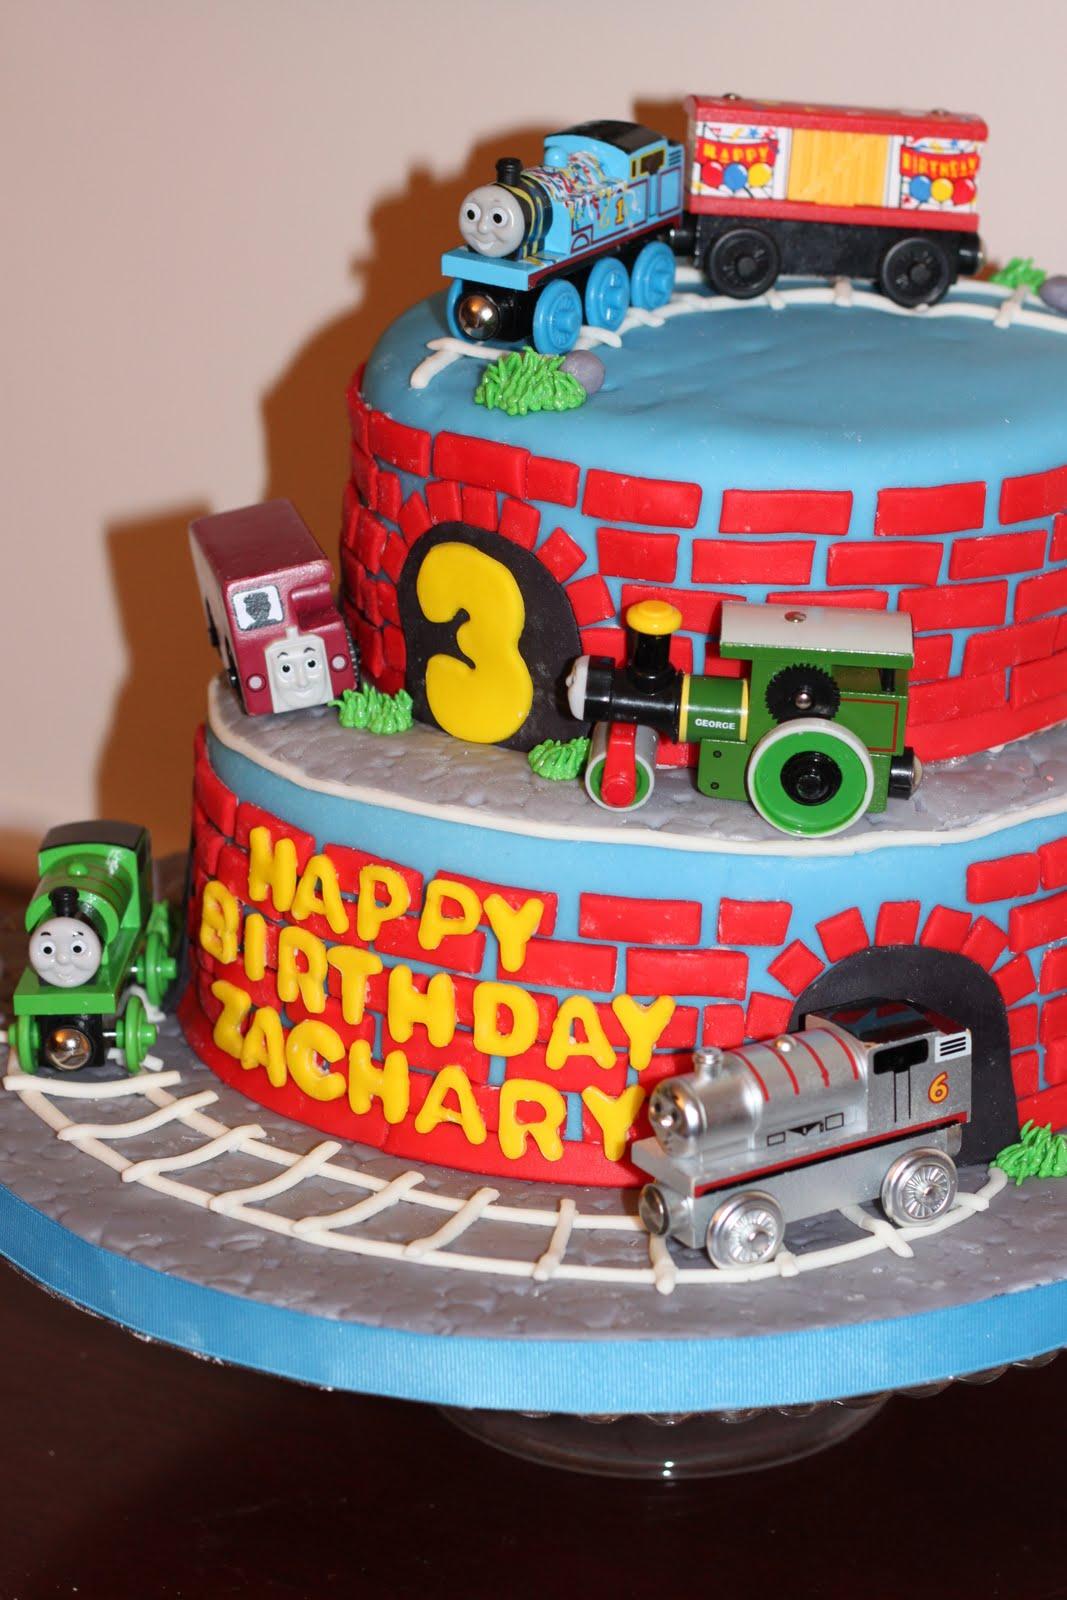 Pictures Of Thomas The Train Cake : Delightful Slice: Thomas the Train Cake